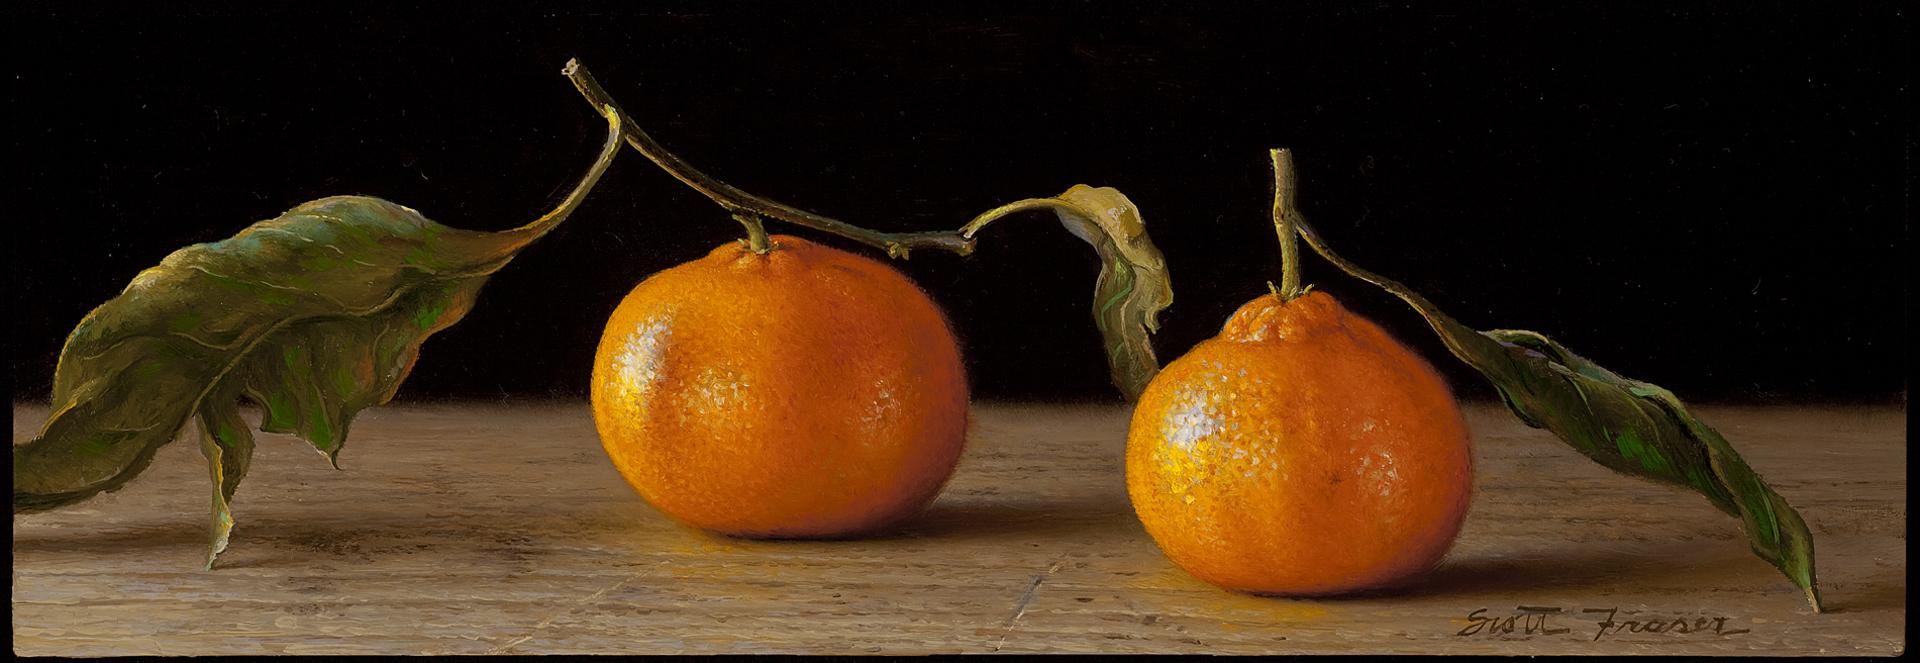 Two Satsumas by Scott Fraser